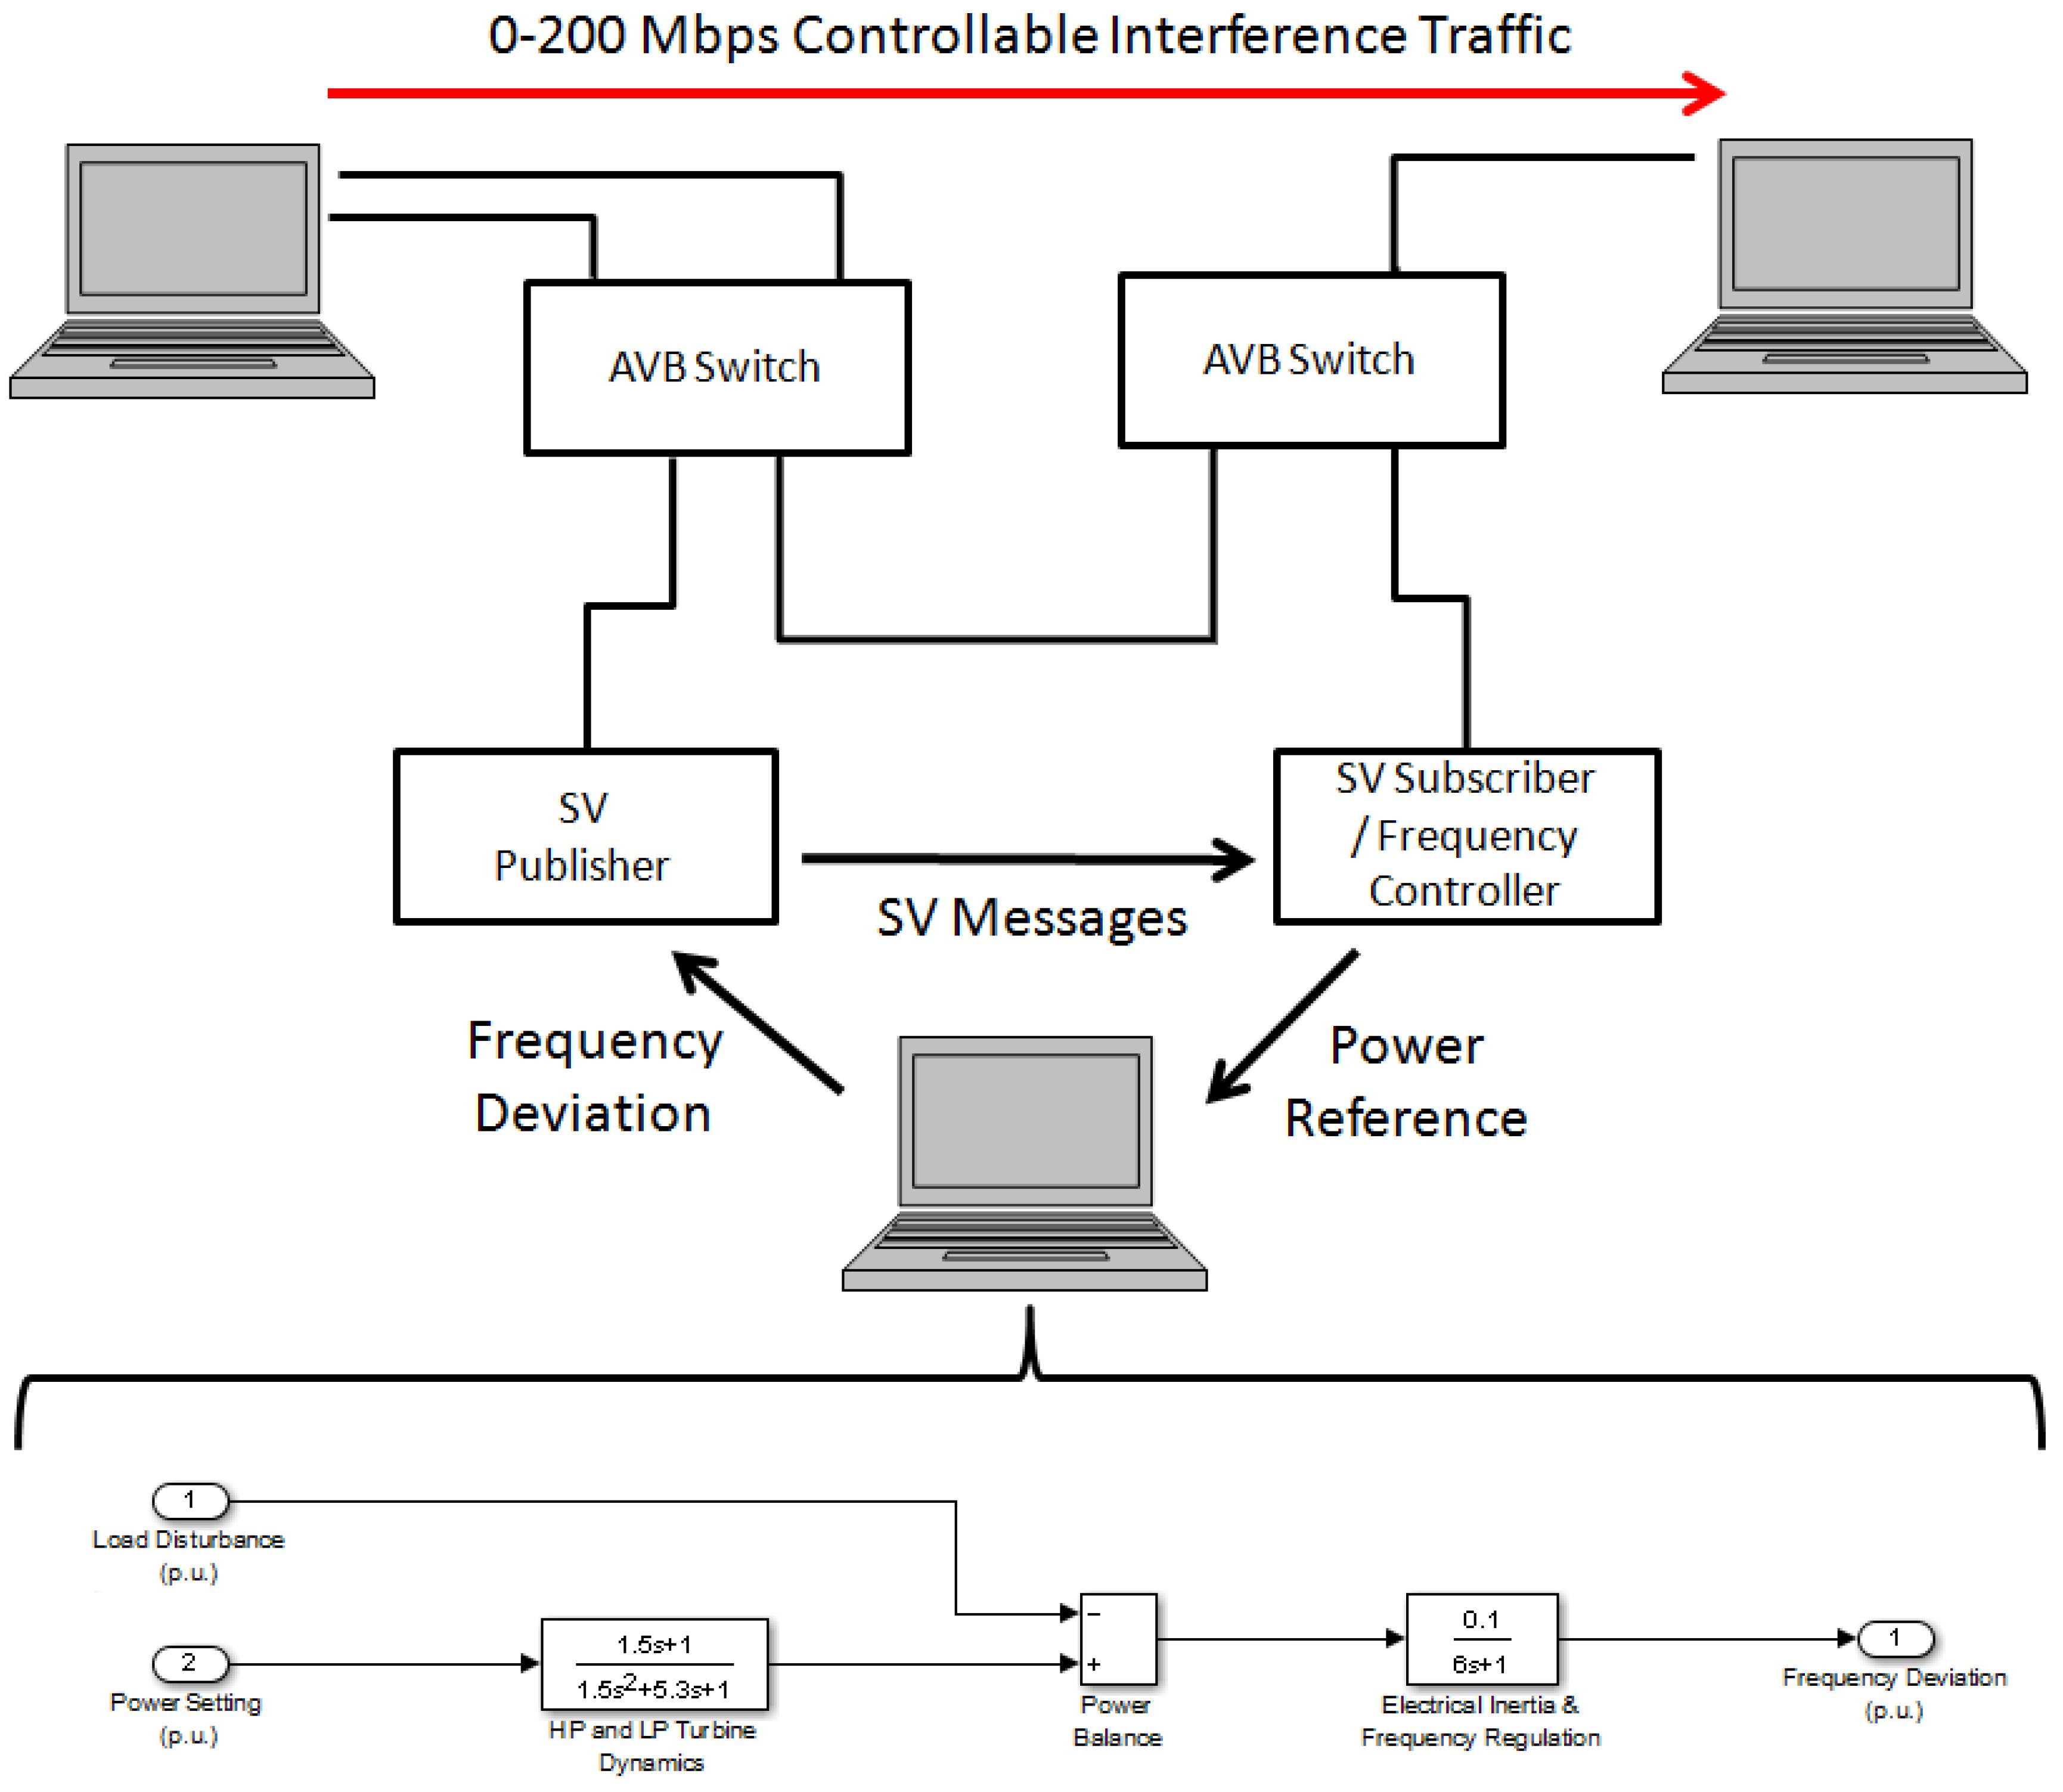 Free Iec104 simulator - full file | Channelradar